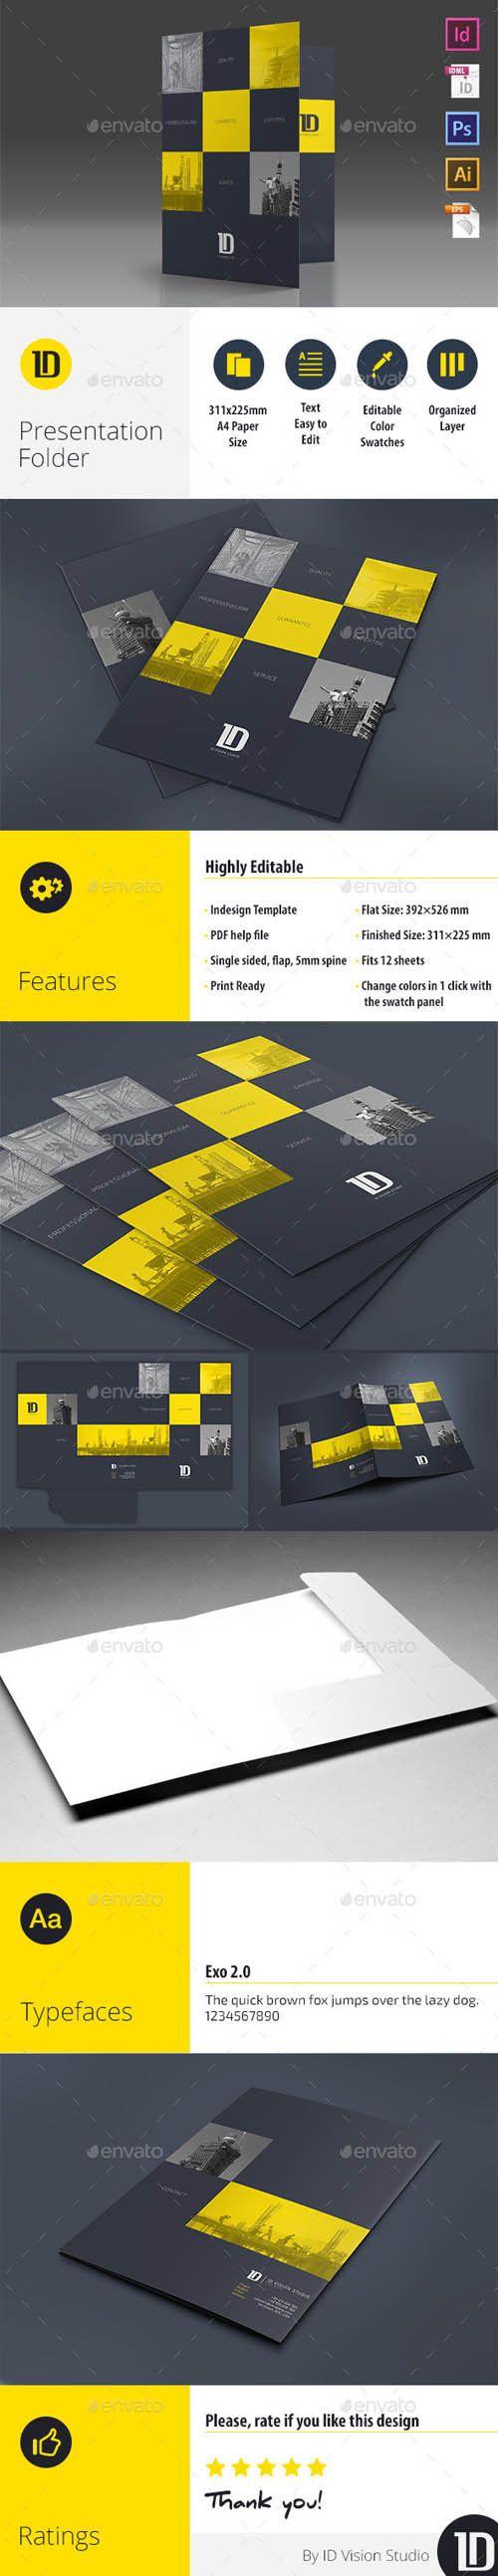 A4 Self Locking Multipurpose Presentation Folder 002